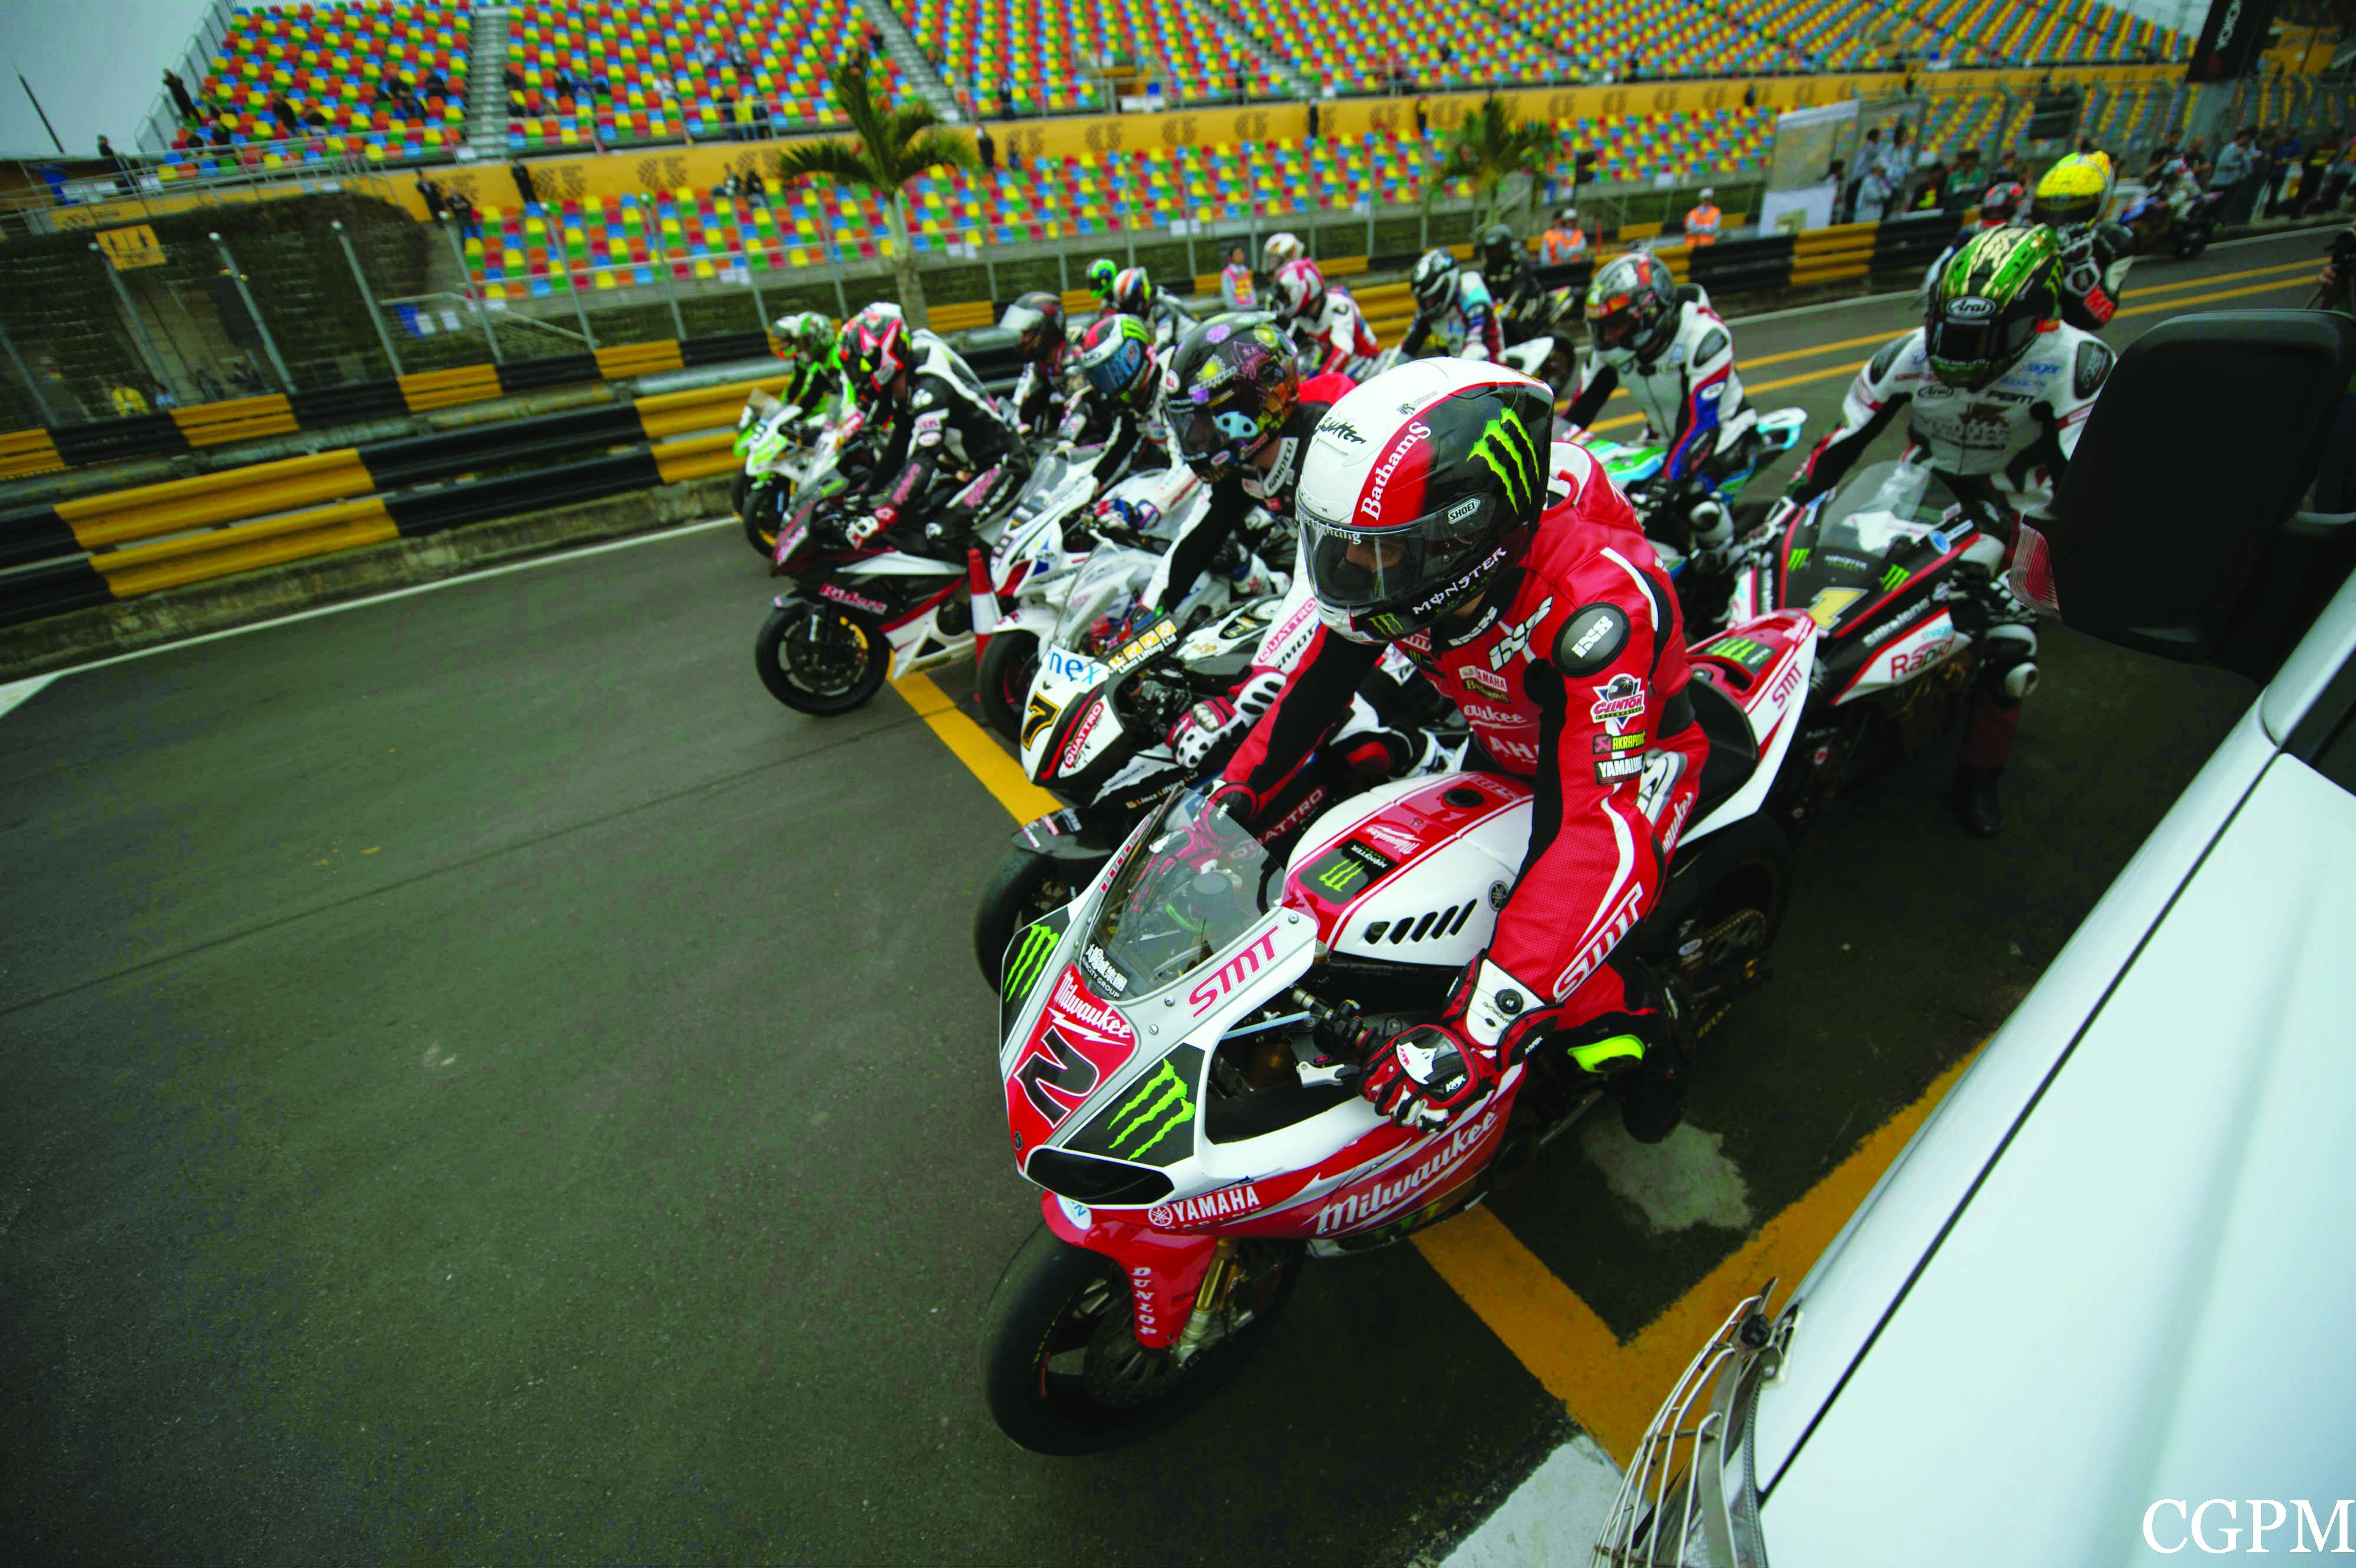 Macau Grand Prix 2017 >> Get Up To Speed With The 63rd Macau Grand Prix South China